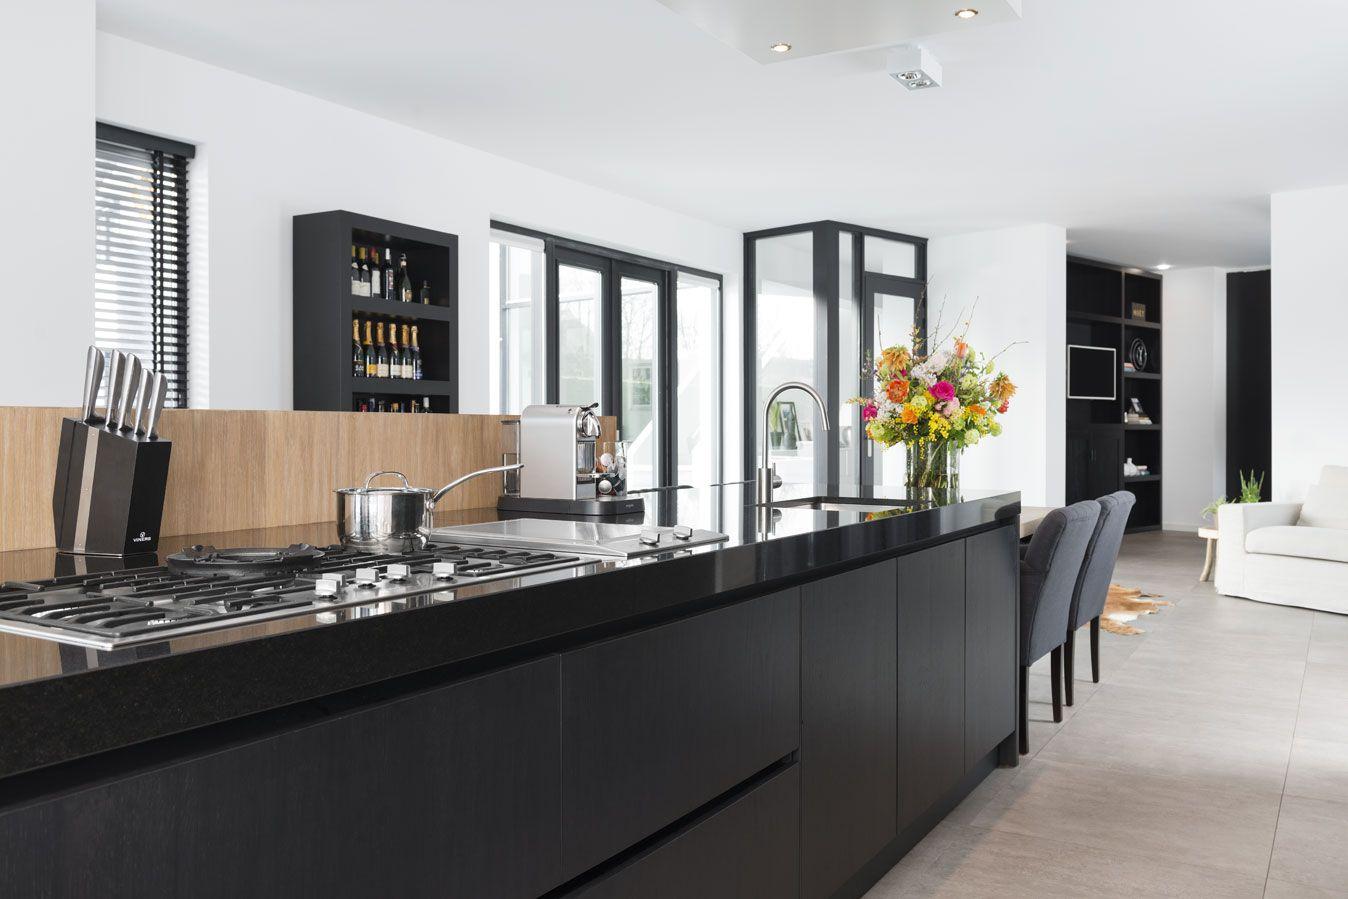 Modern landelijk kookeiland kitchen pinterest for Keuken landelijk modern